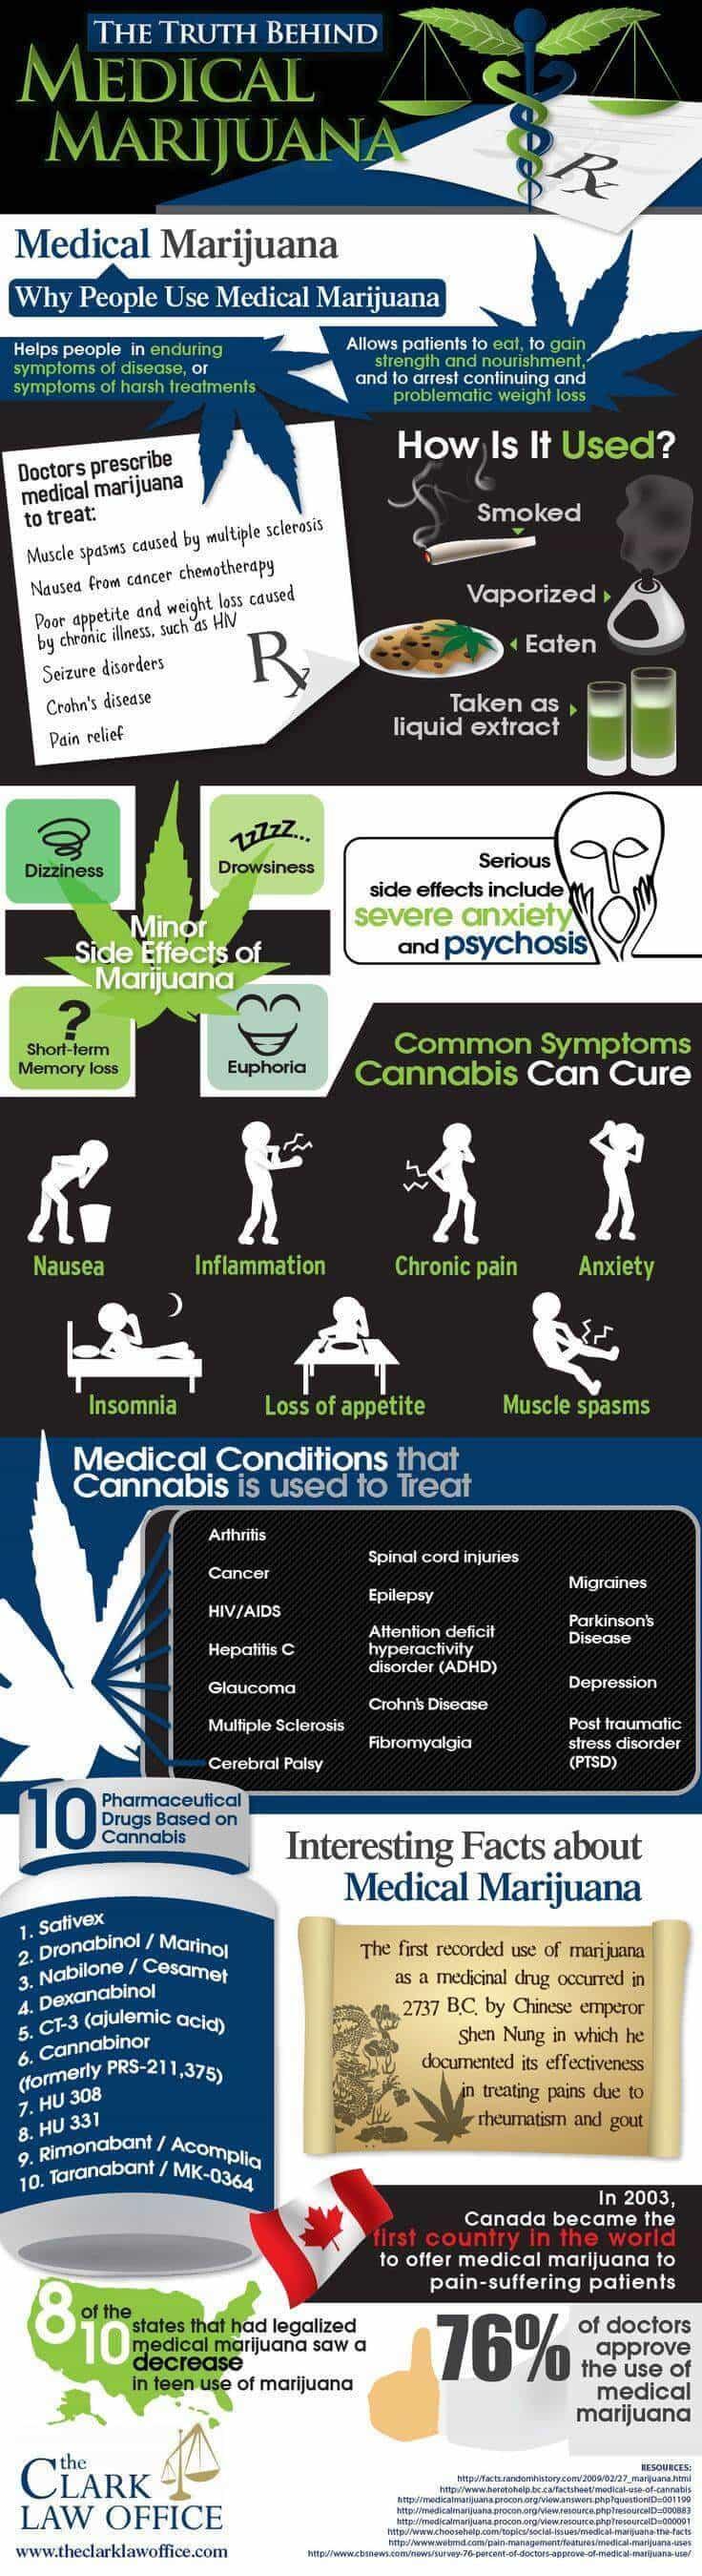 The-Truth-Behind-Medical-Marijuana